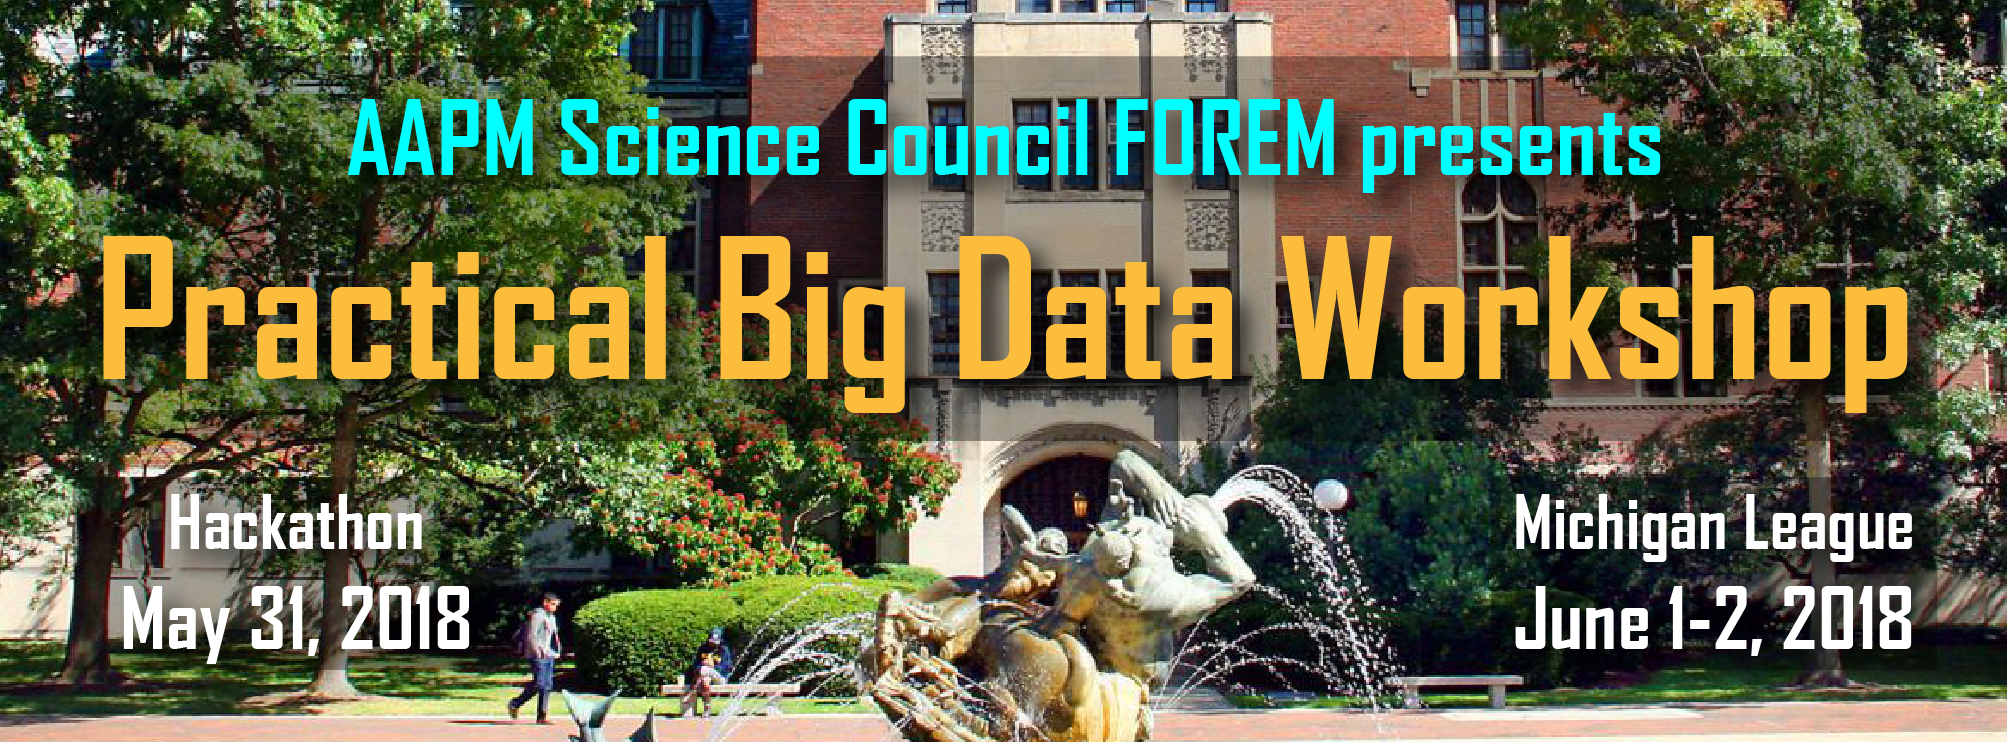 2018 AAPM Practical Big Data Workshop